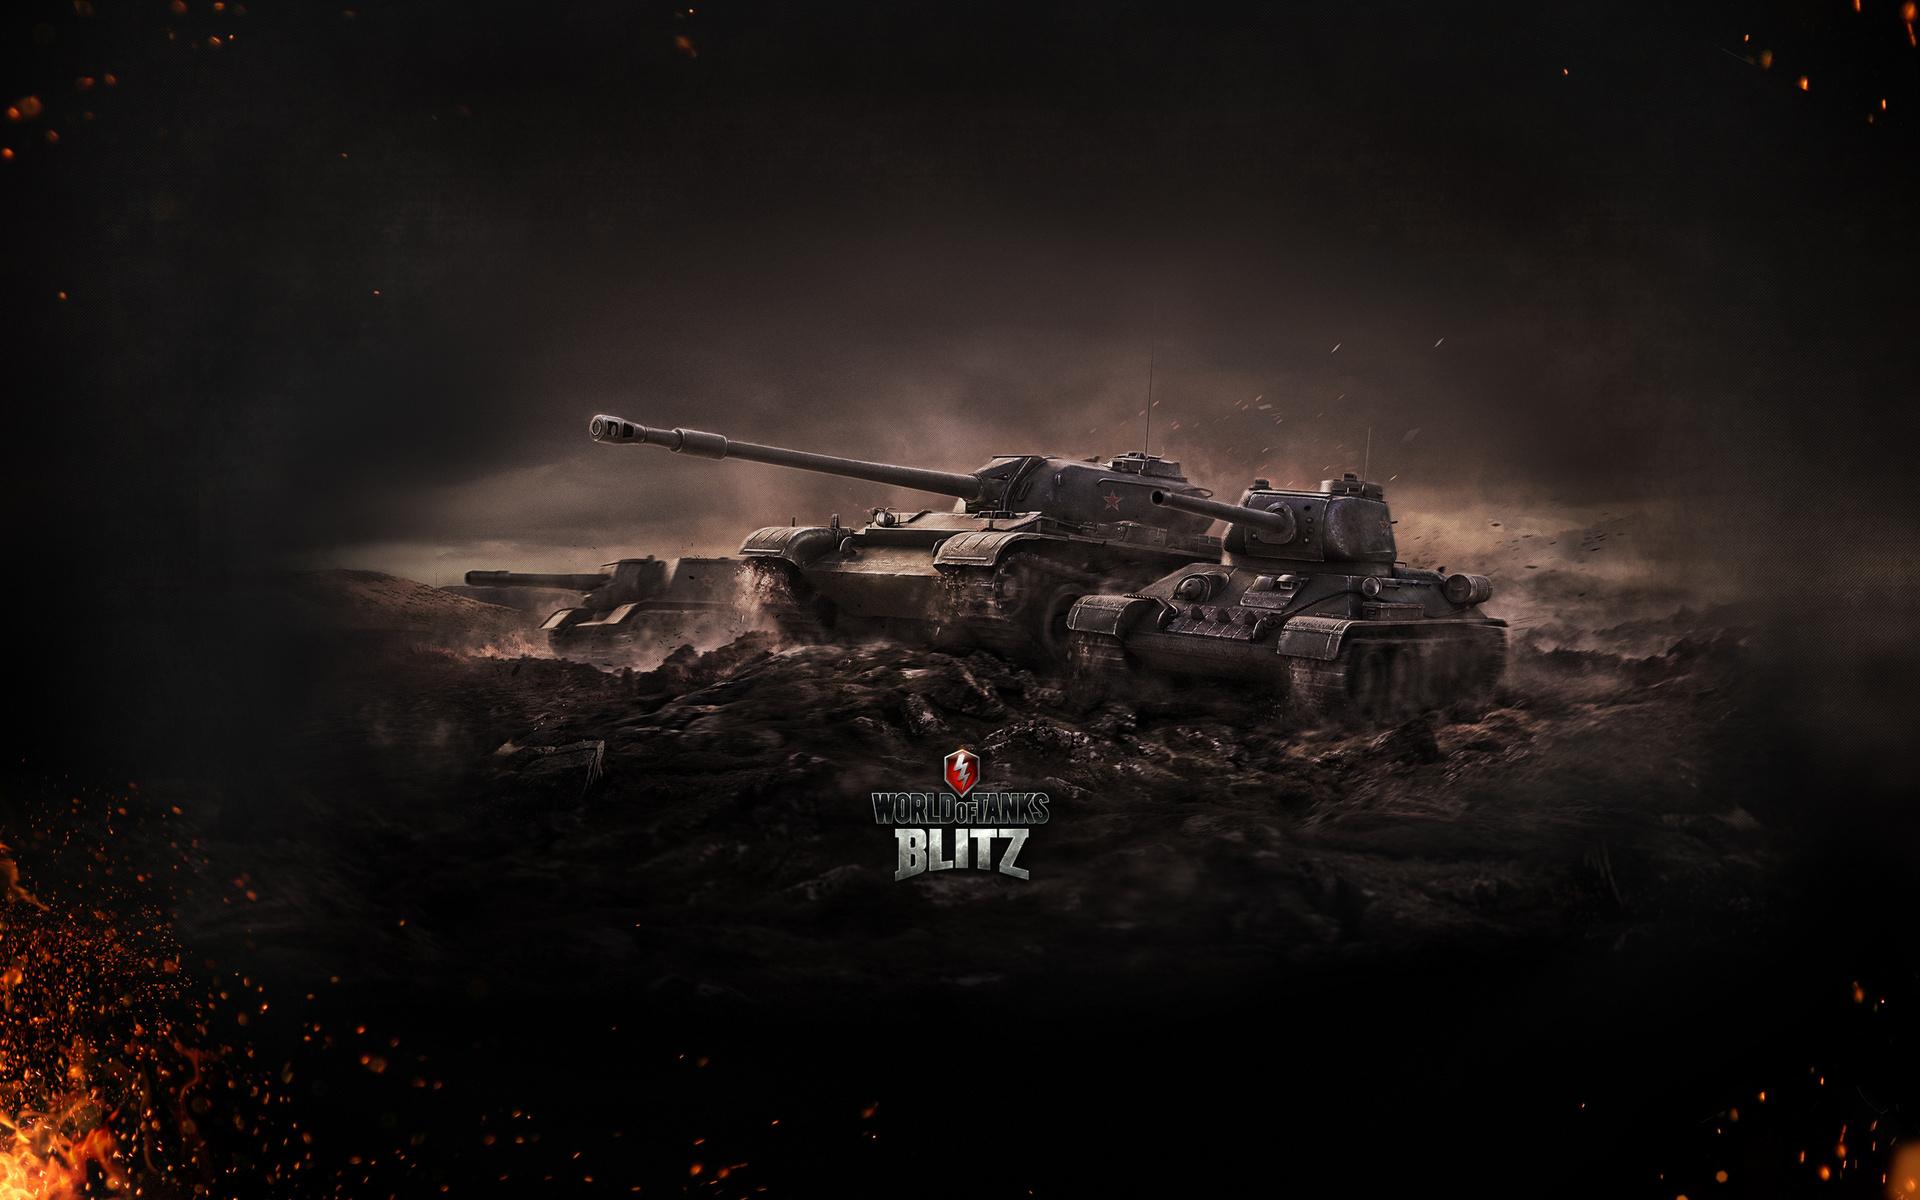 World Of Tanks Blitz Su 152 Full HD Wallpaper